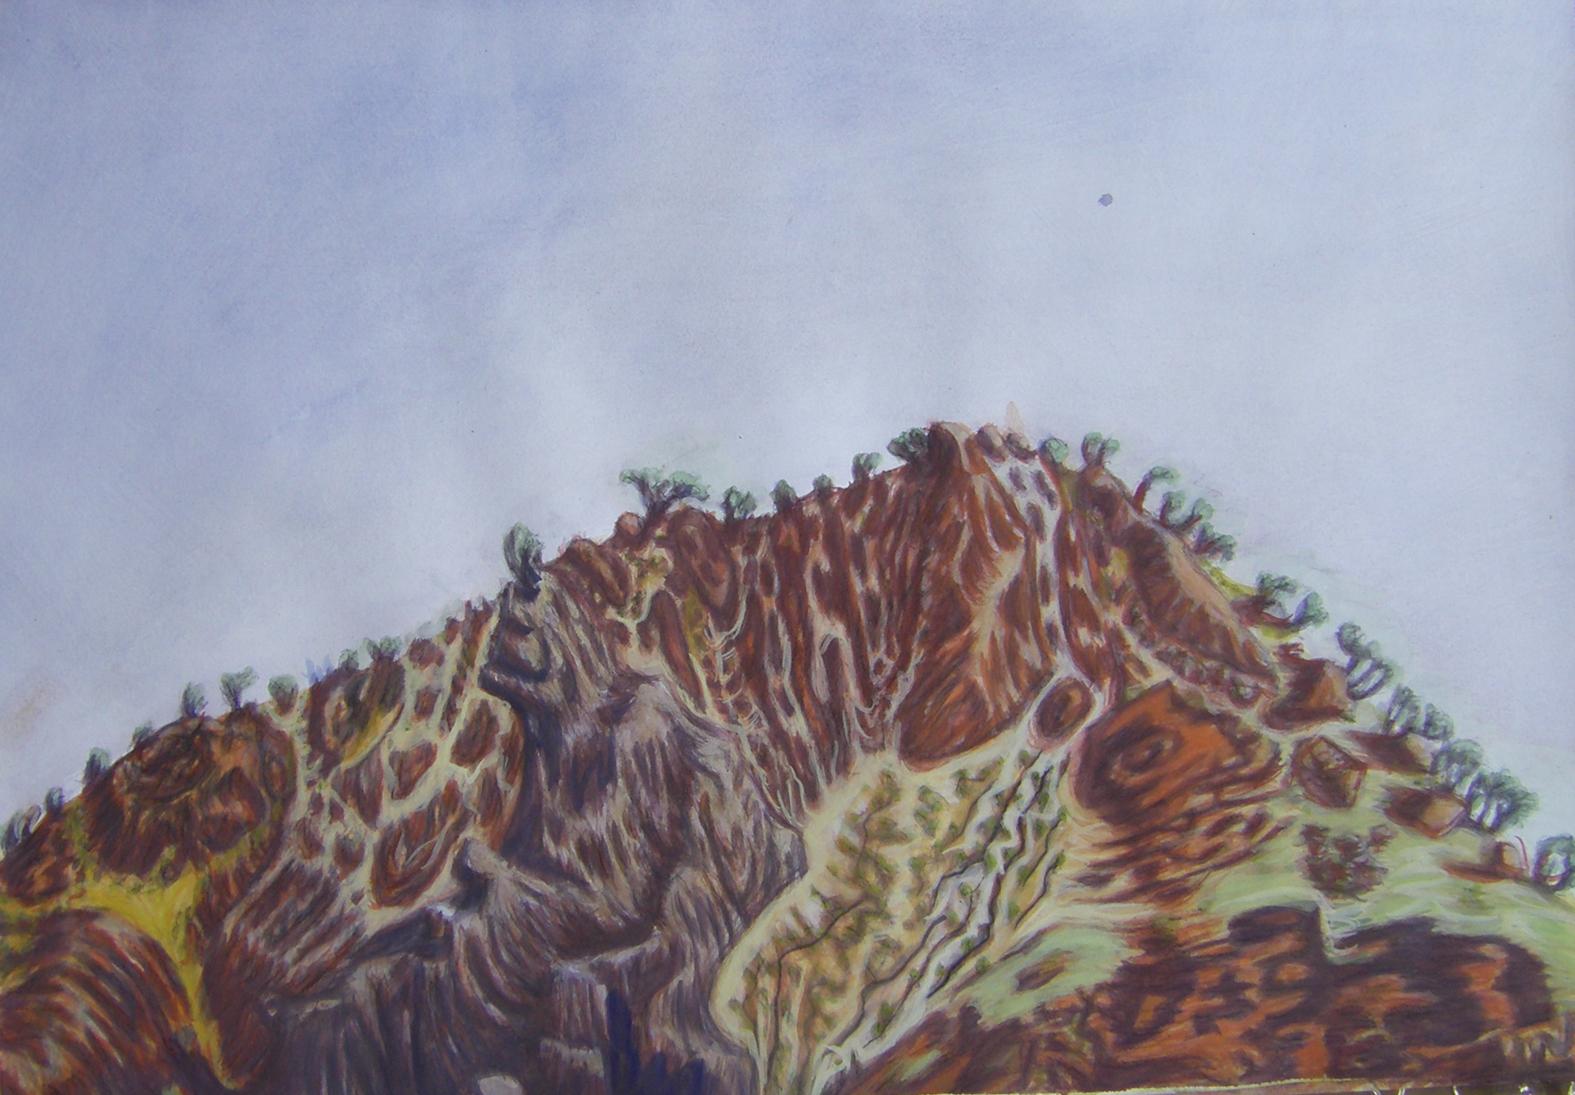 Weetootla-gouache&pencilonpaper60x40cm2015